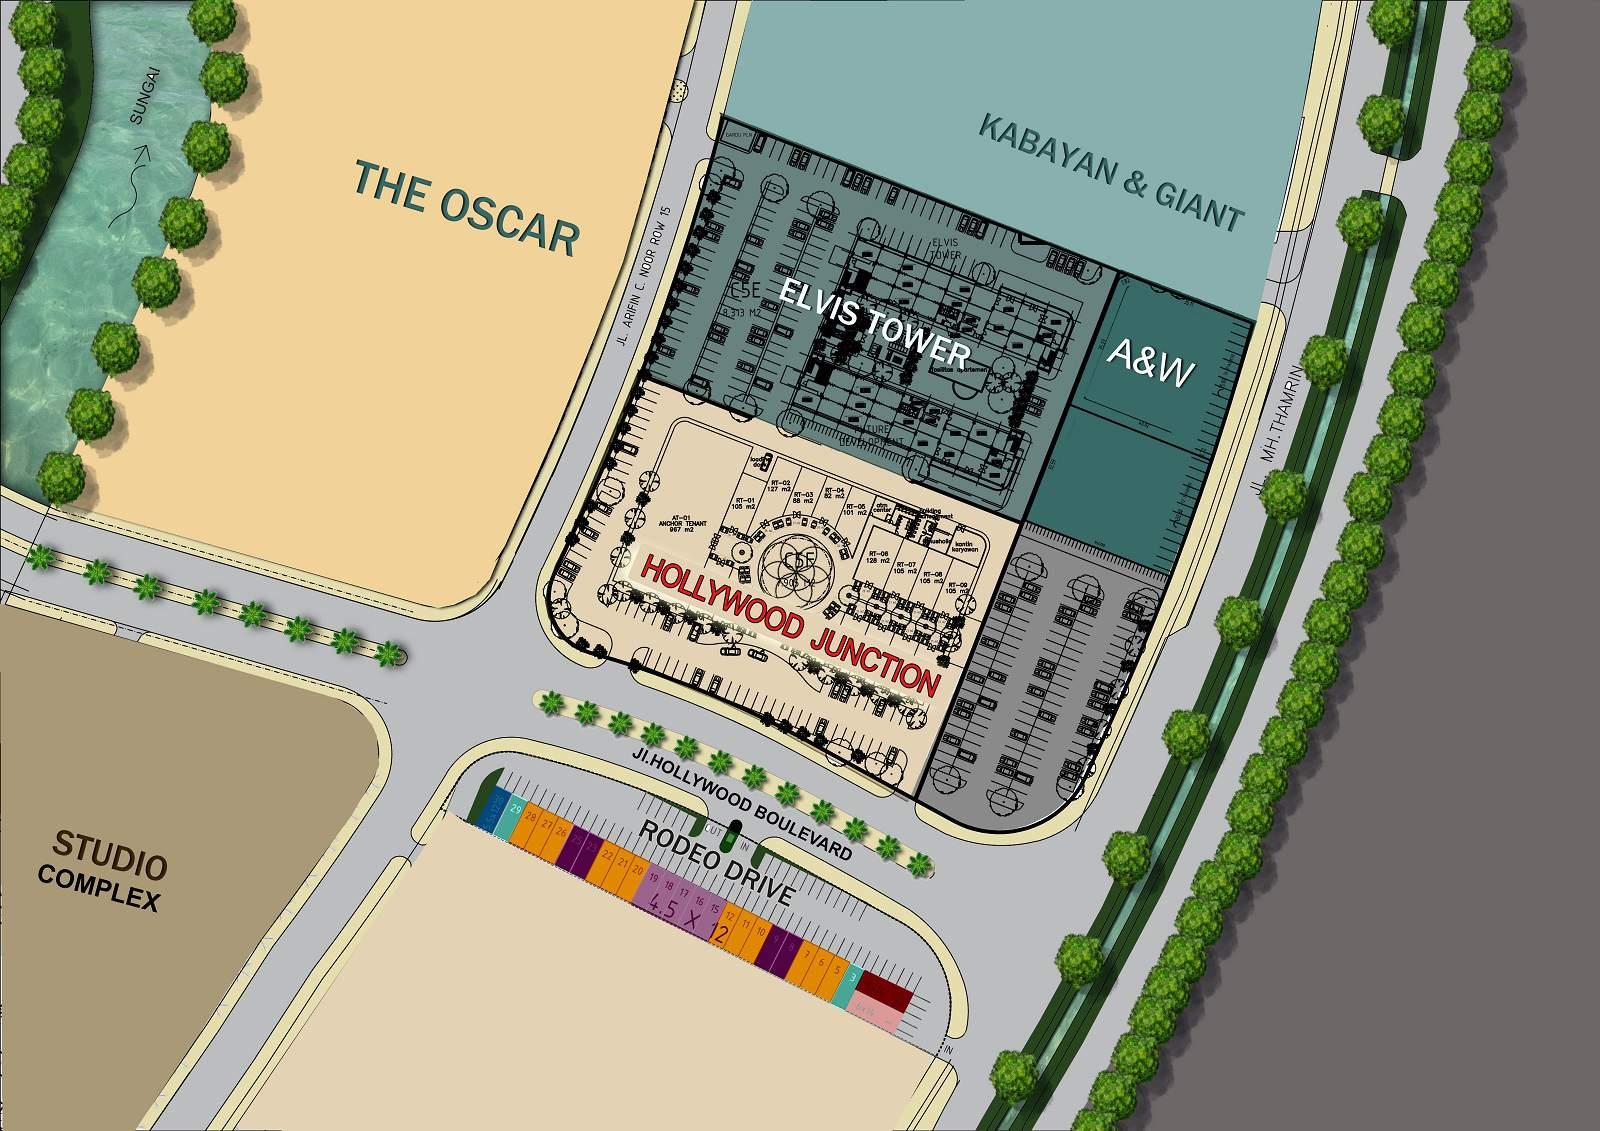 jababeka residence ruko rodeo drive siteplan